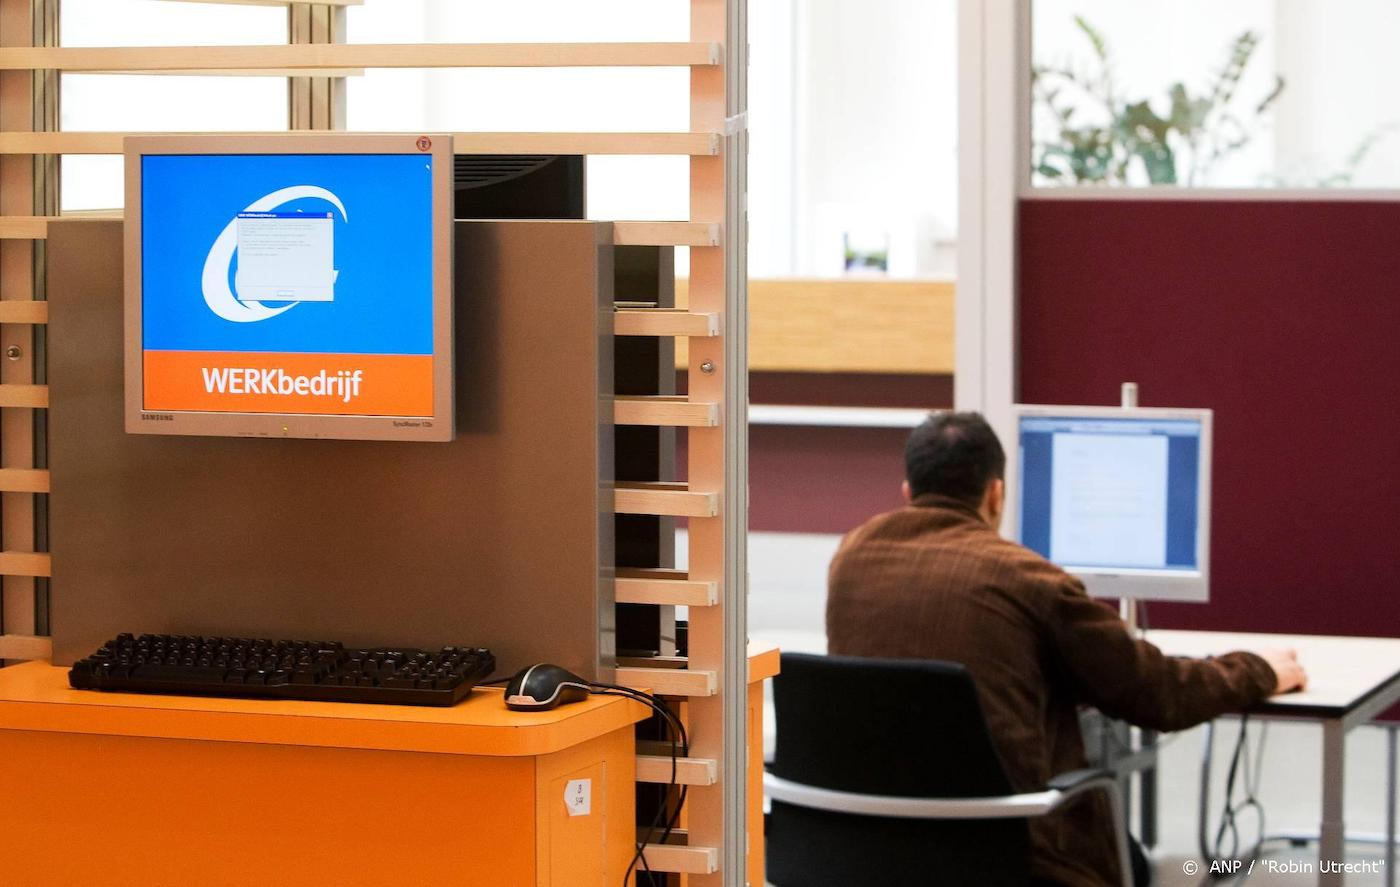 IBM: 'Gestolen inlog werknemer grootste probleem cybersecurity'